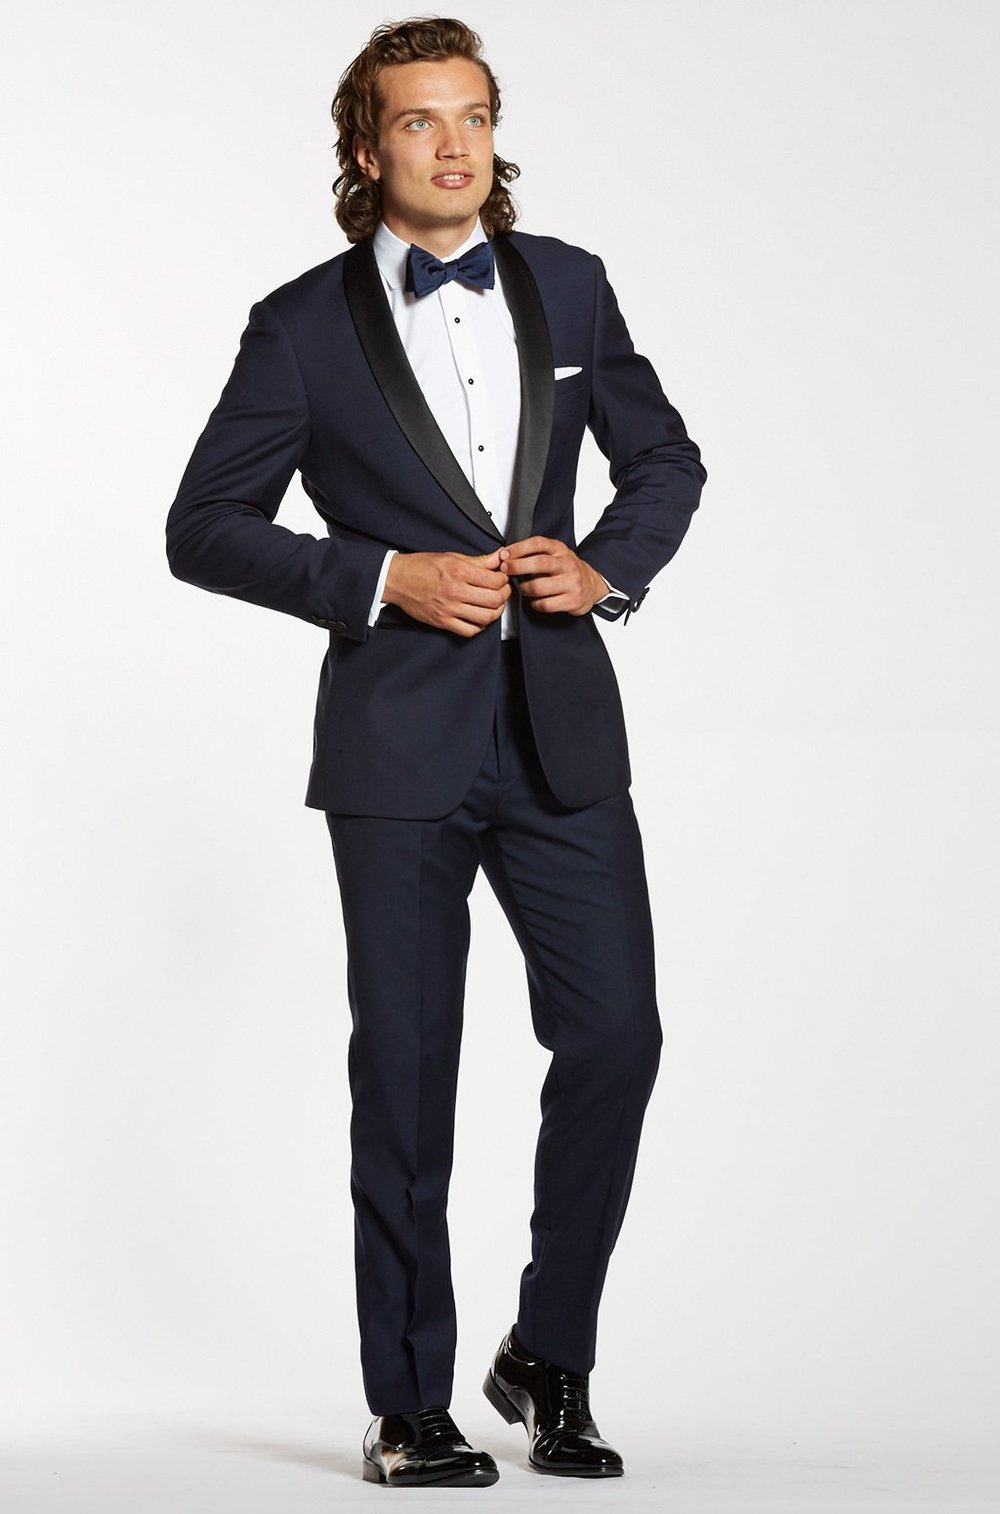 Premium Shawl Lapel Navy Tuxedo Jacket, $189,  The Groomsman Suit